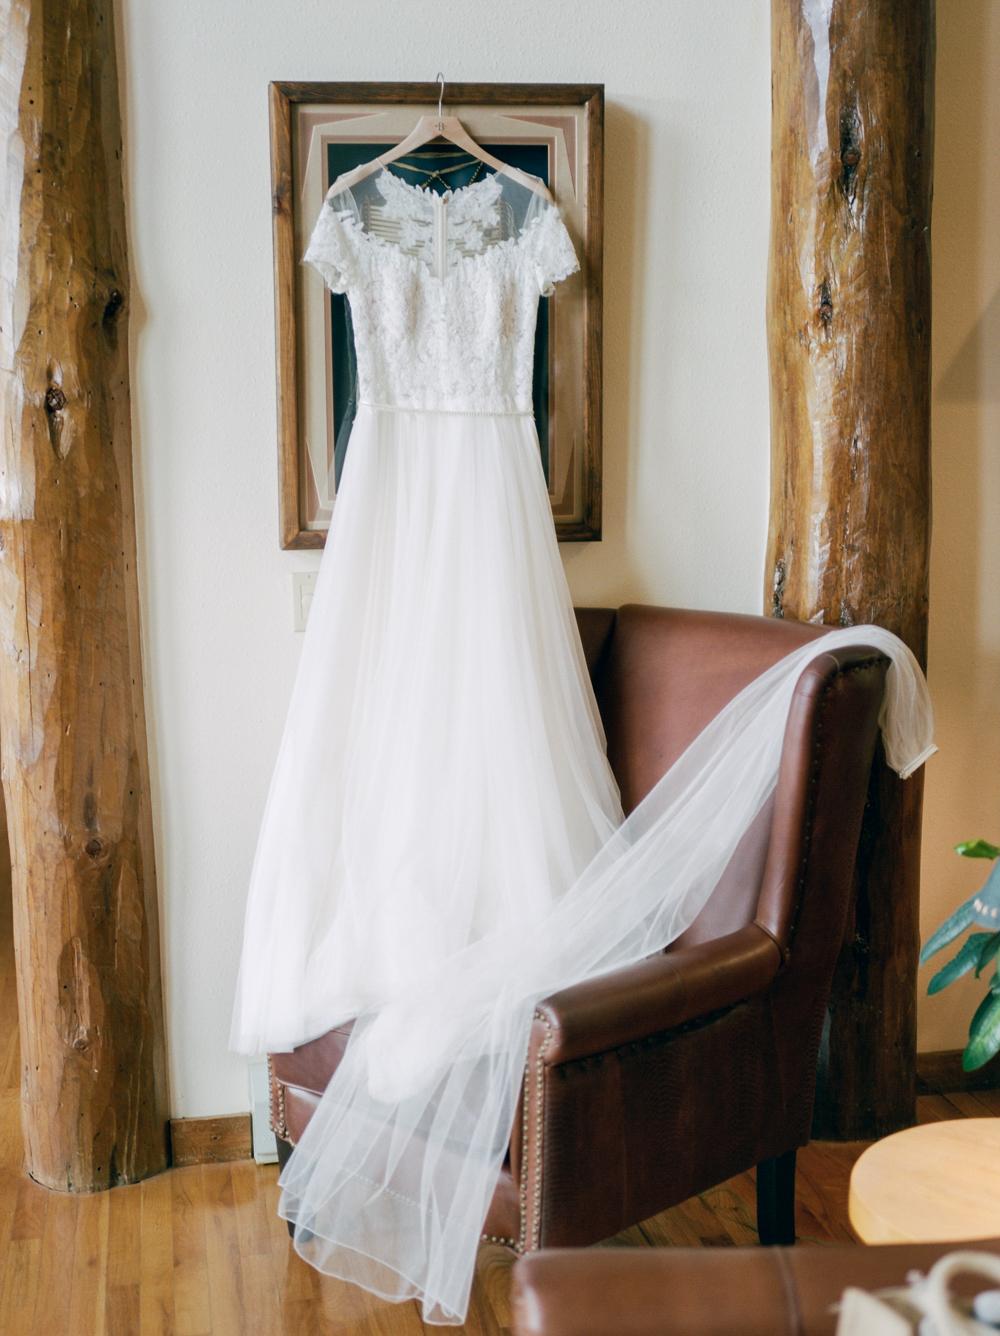 Bostick-Durham-Wedding-83.jpg